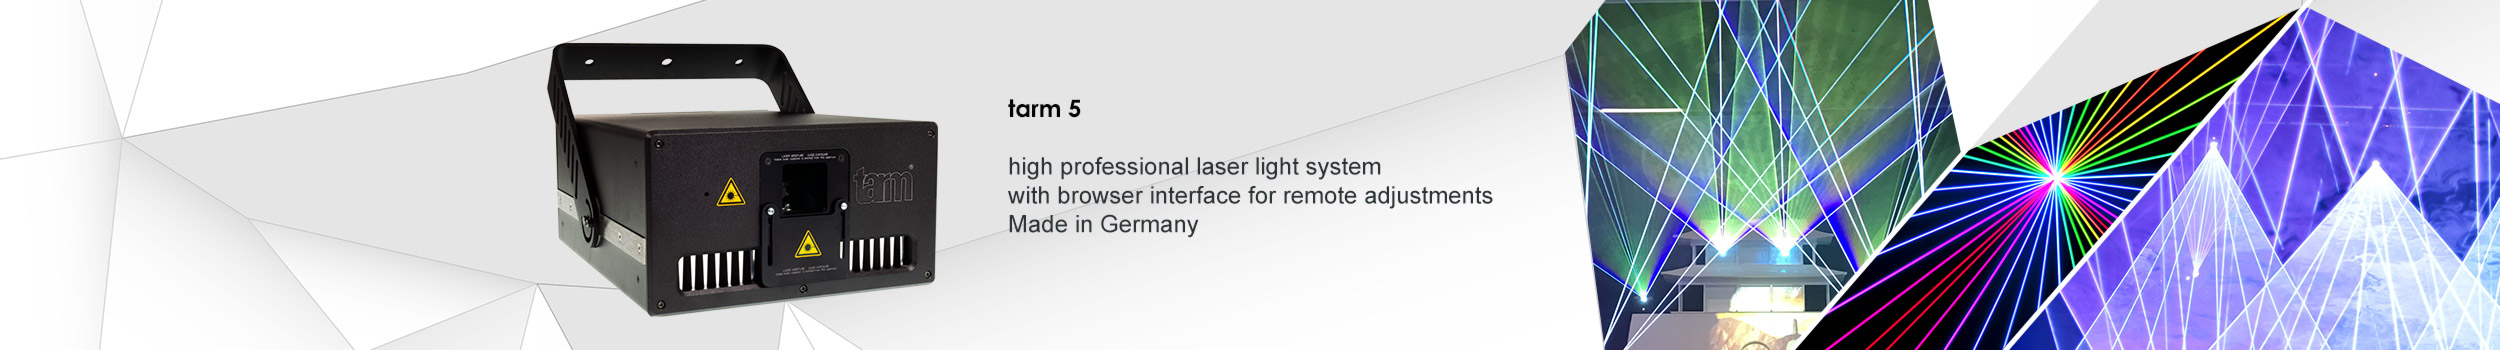 tarm 5 show laser